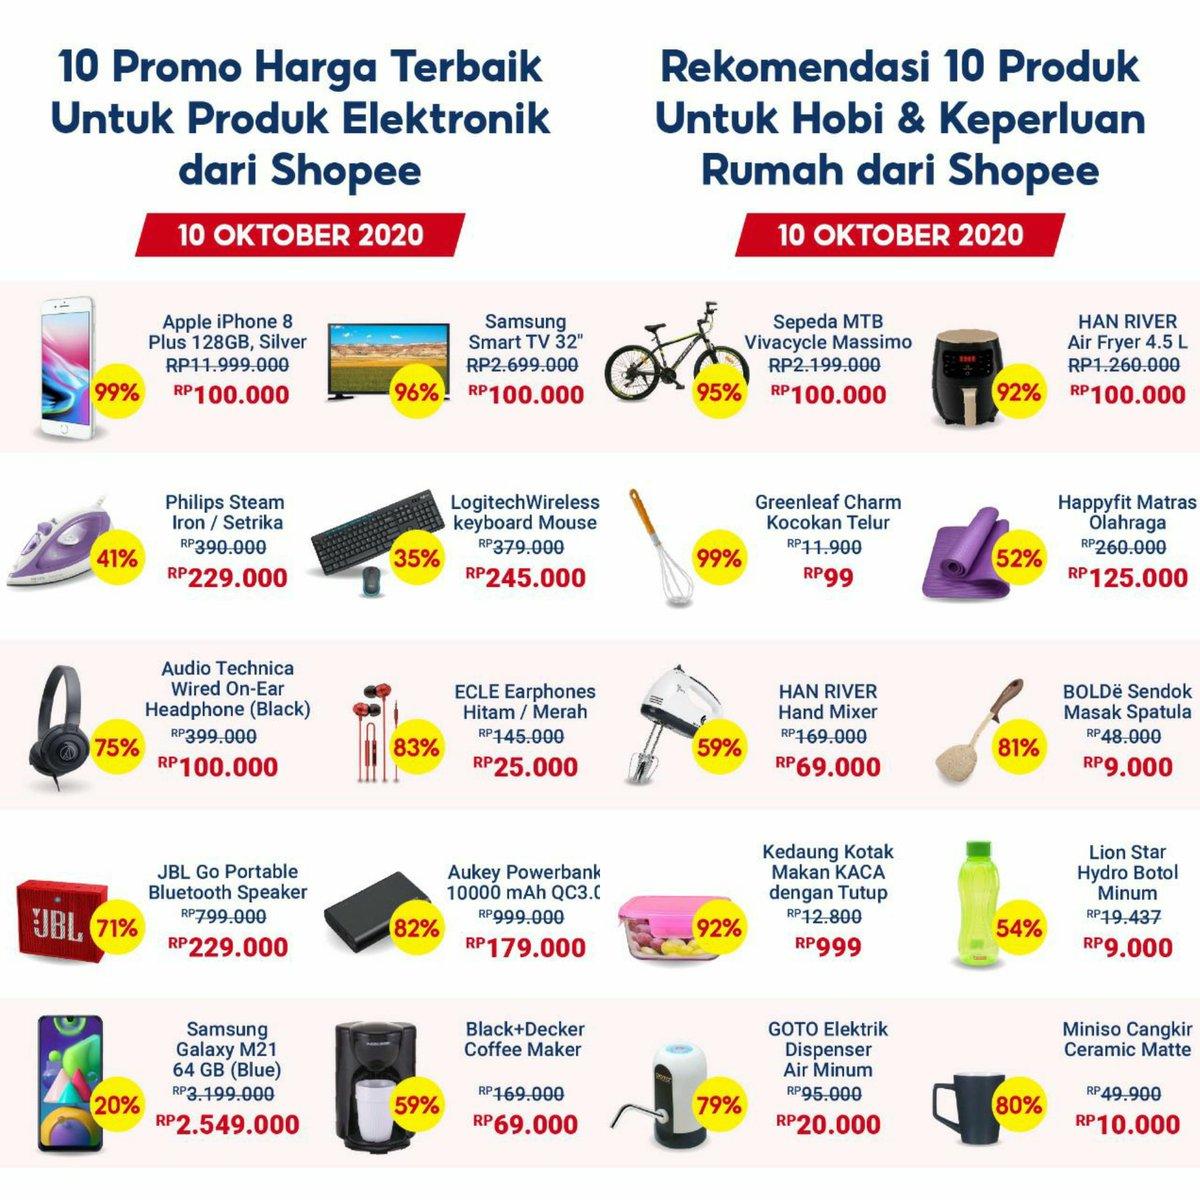 Racun Belanja Info Diskon Promo Cashback On Twitter Ini Daftar Promo Harga Terbaik Shopee Setiap Kategori Mulai 10 Oktober 2020 Berani Ngincer Flash Sale Iphone 8 Tv Samsung Sepeda Dll